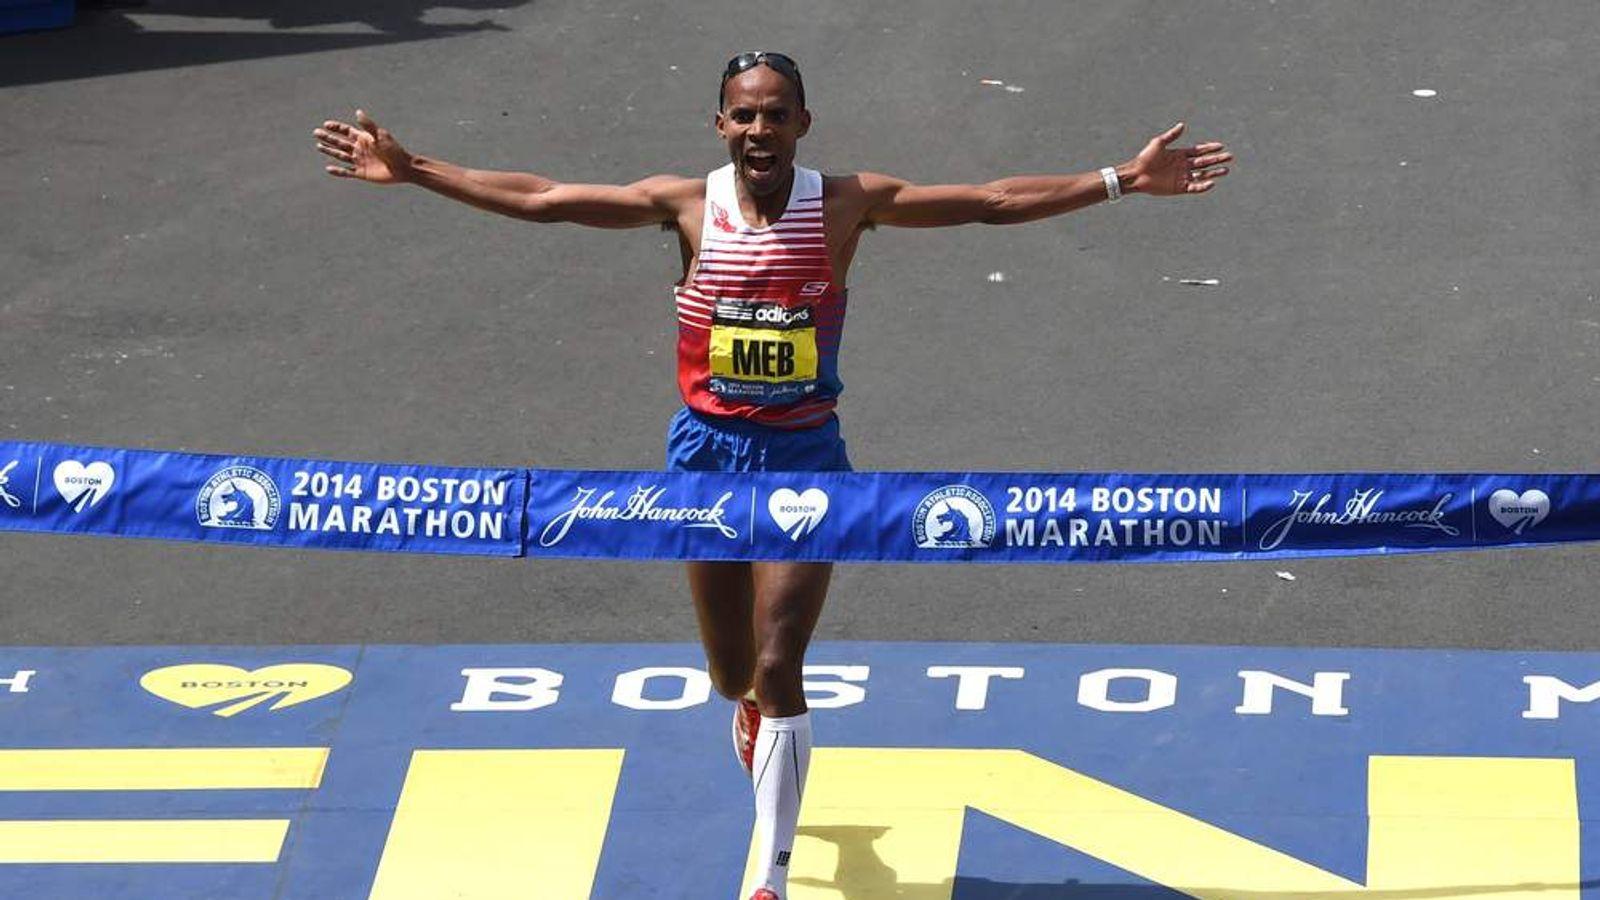 American Meb Keflizighi wins Boston Marathon a year after bombing.